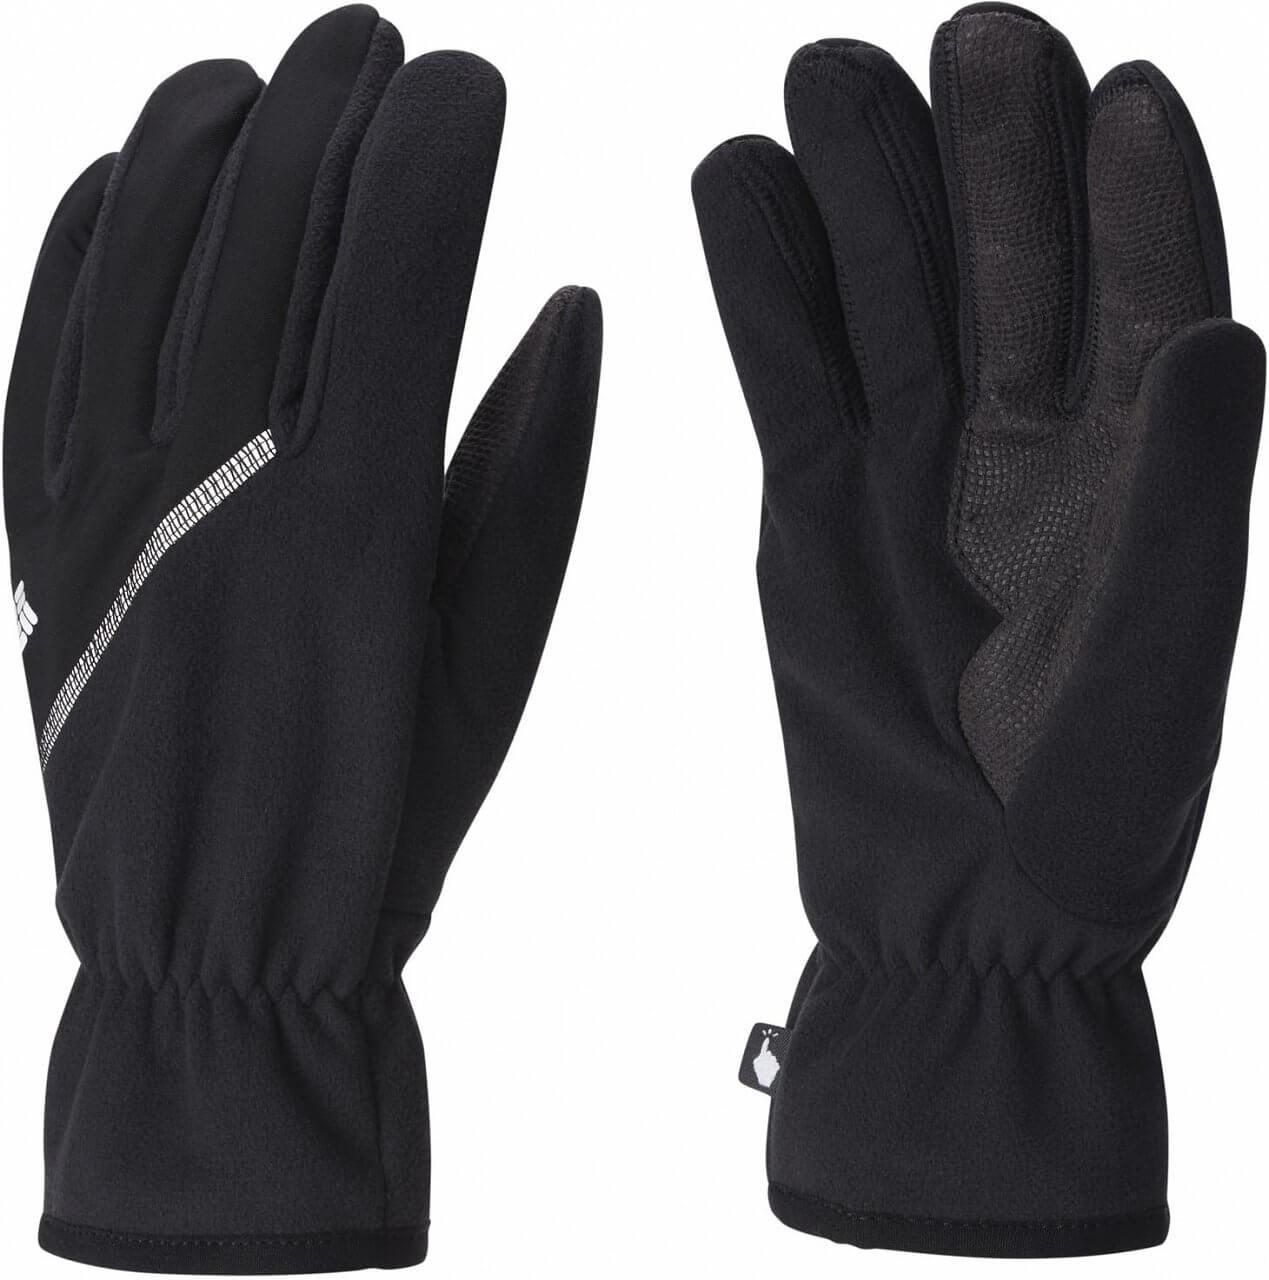 Pánské rukavice Columbia Wind Bloc Men's Glove